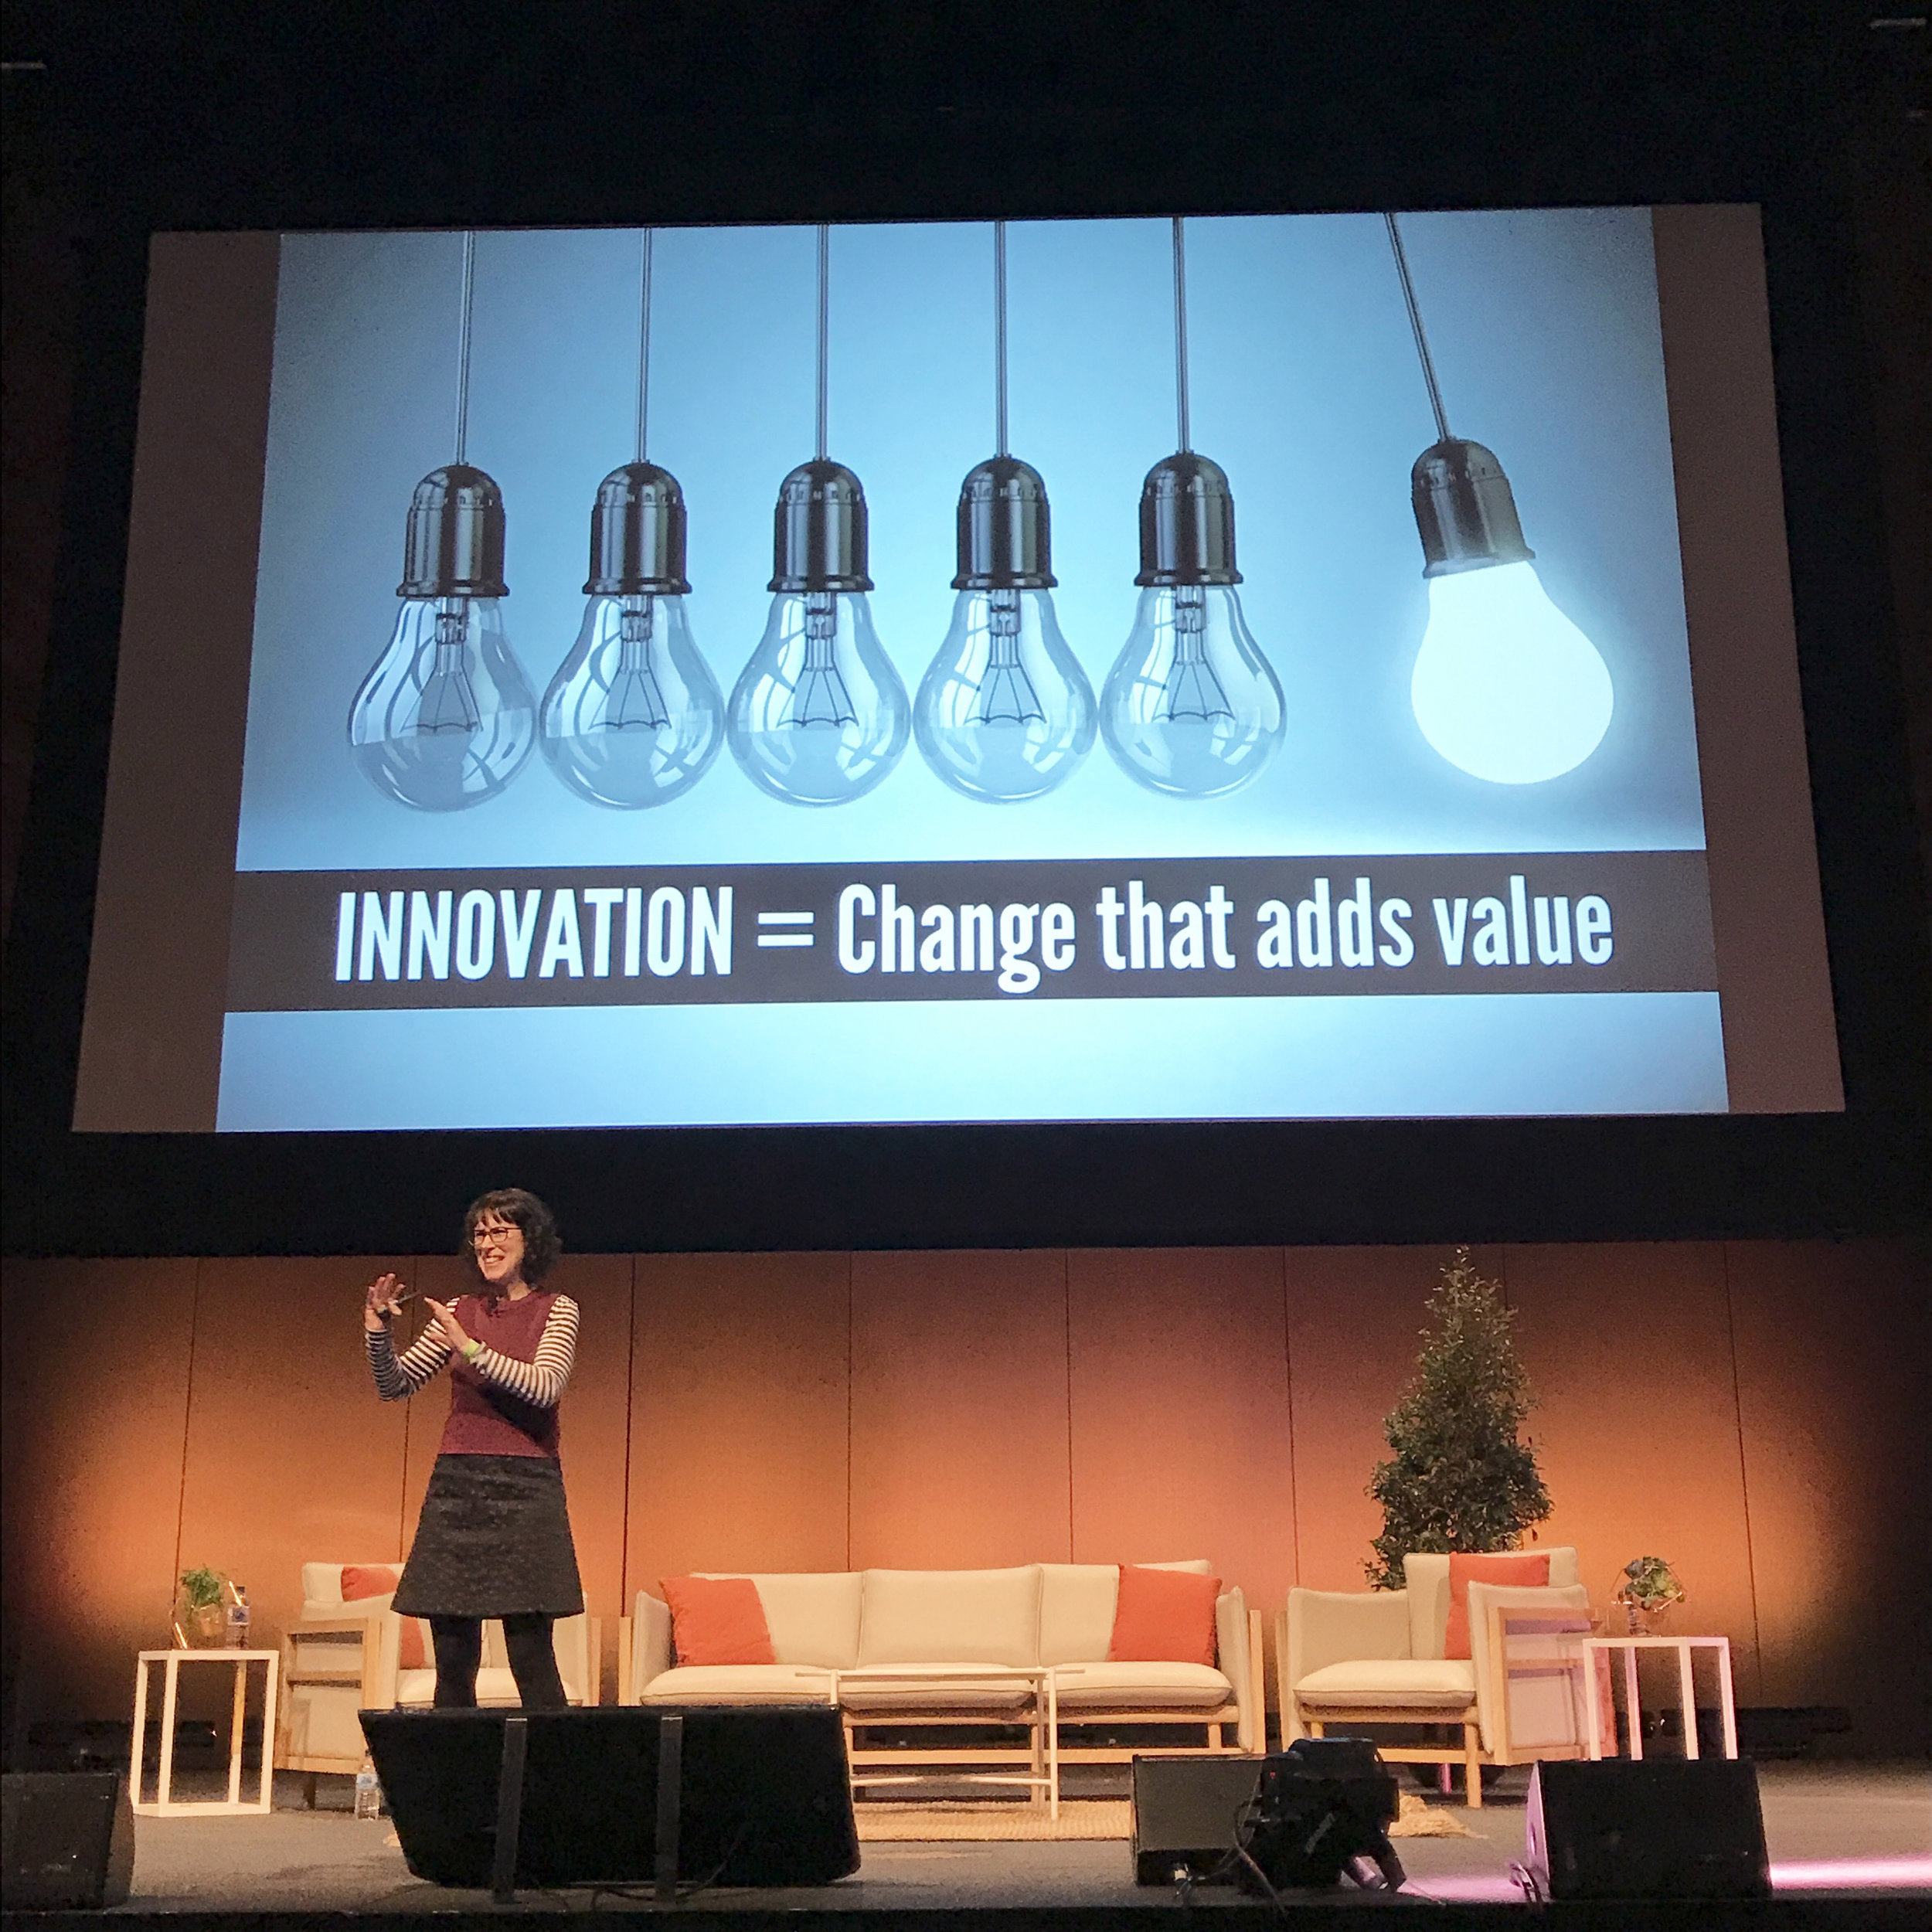 Amantha_Imber_innovation.jpg